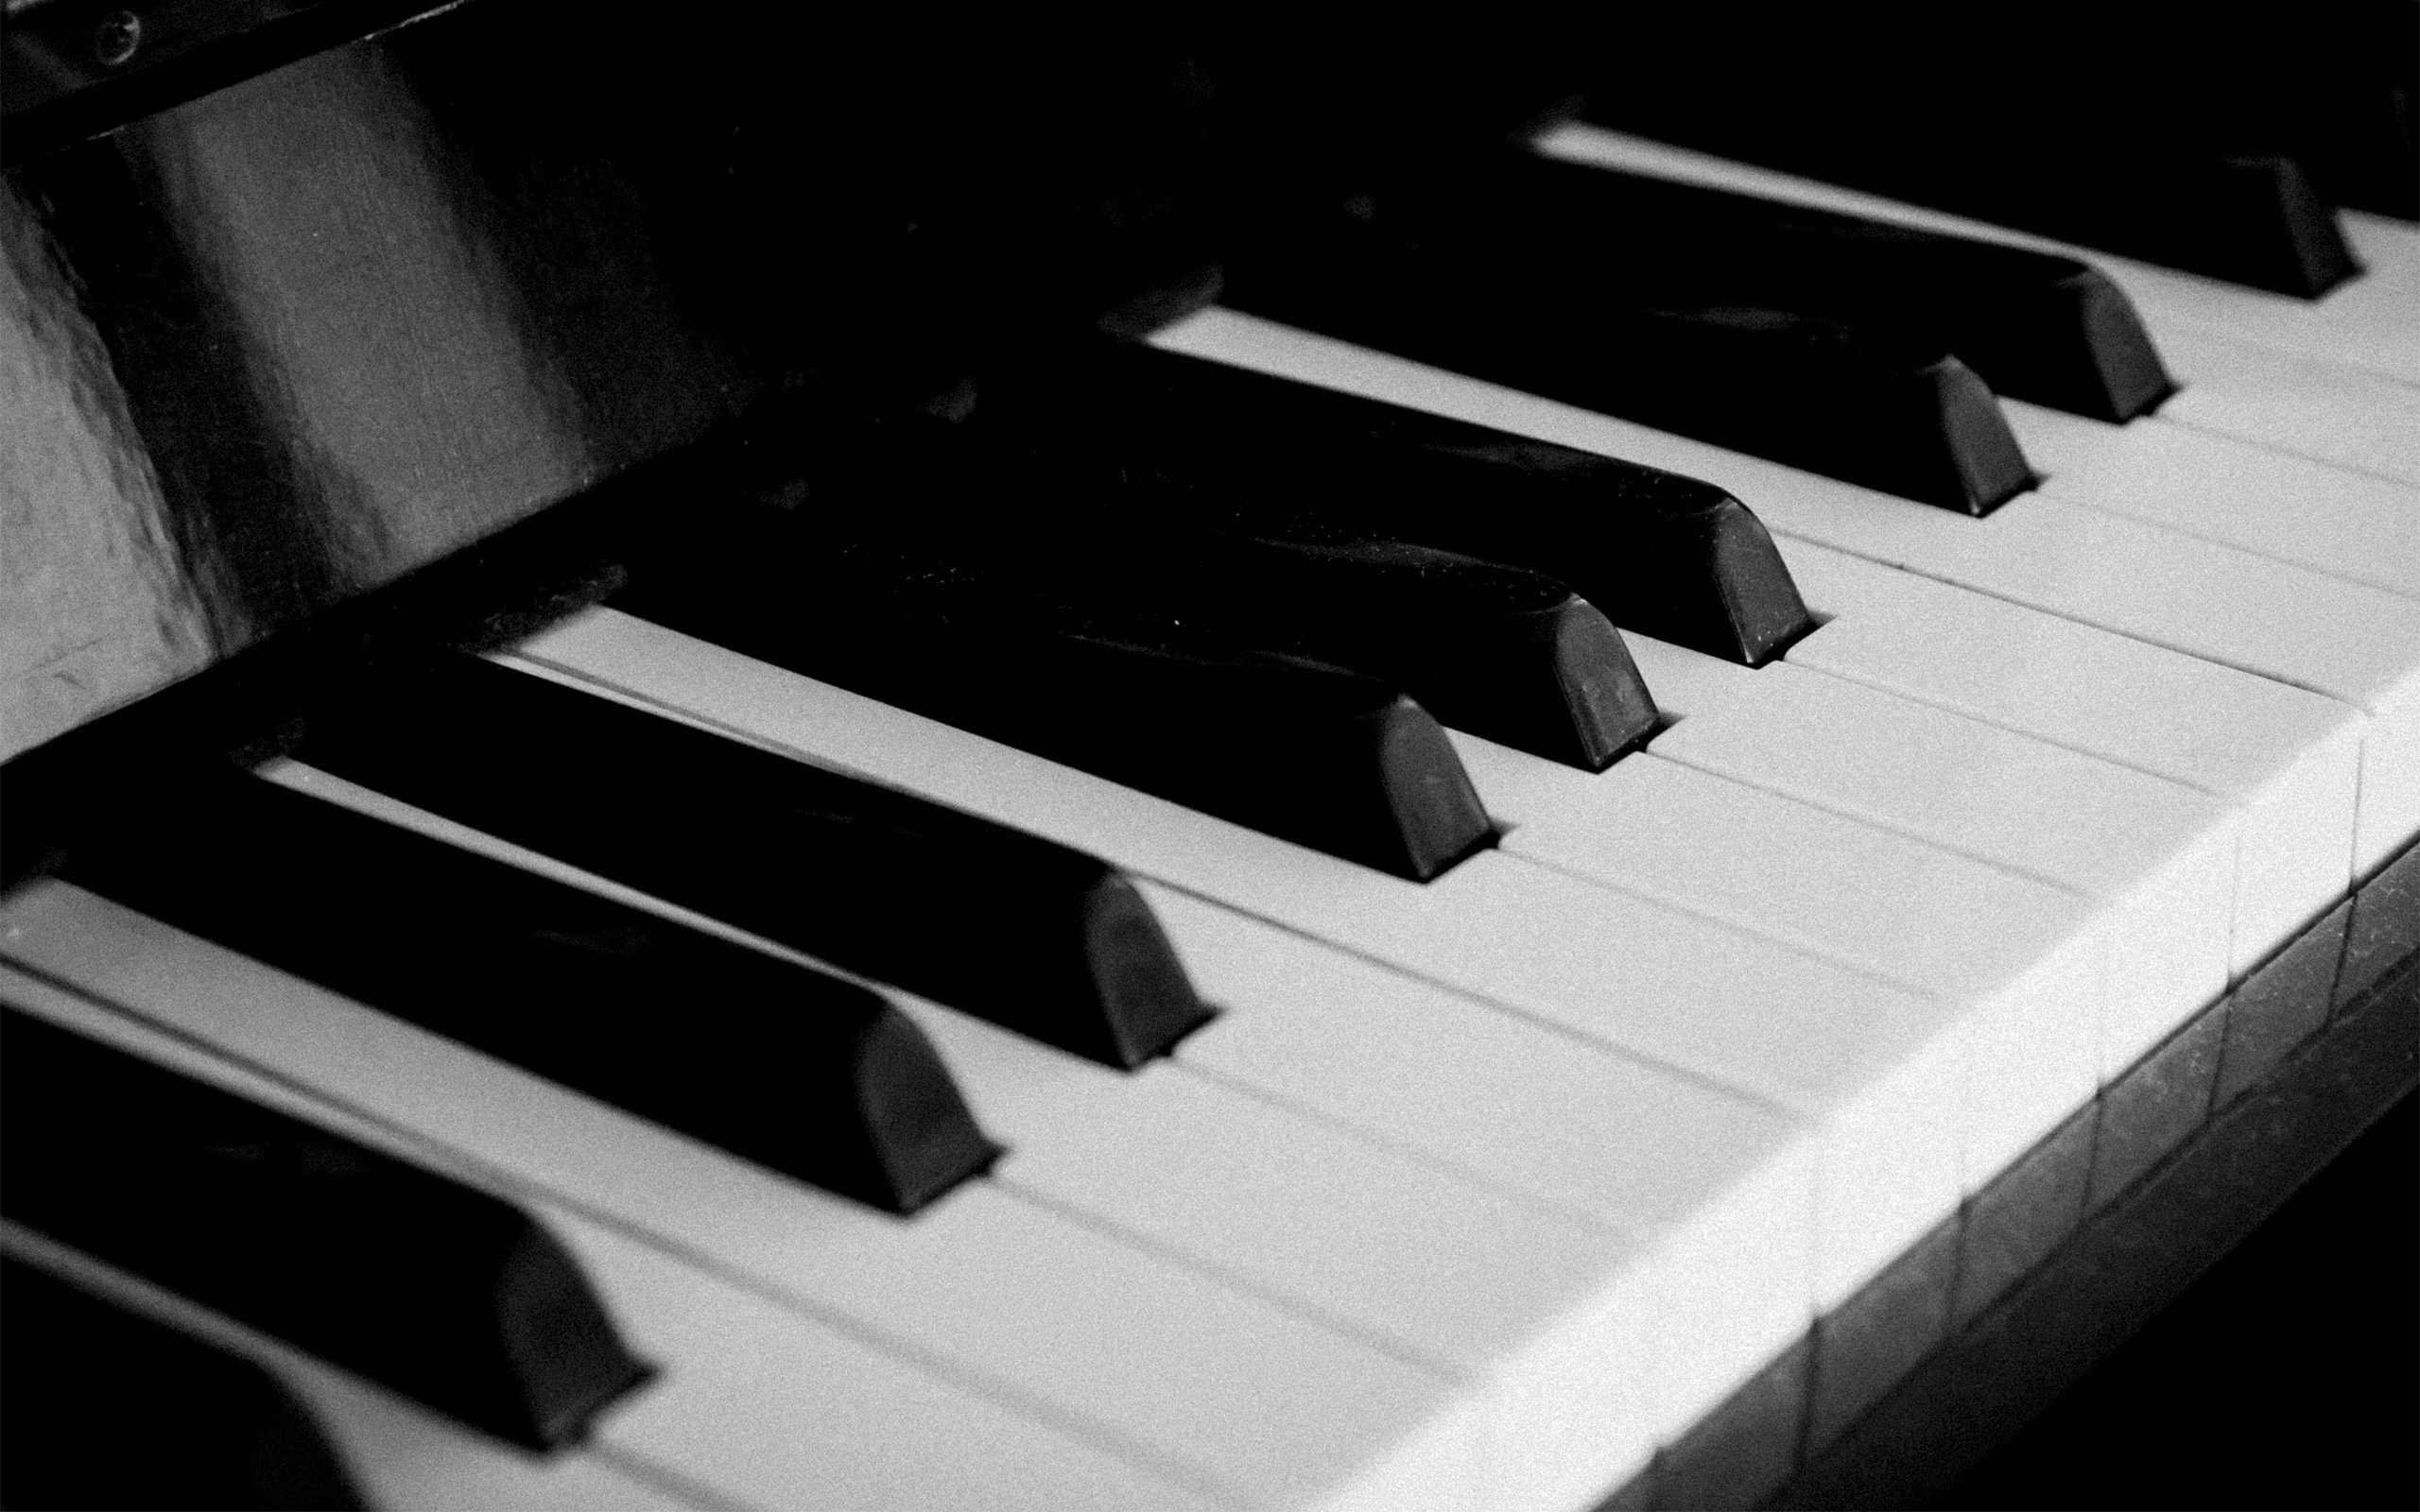 instruments keyboard wallpaper - photo #16